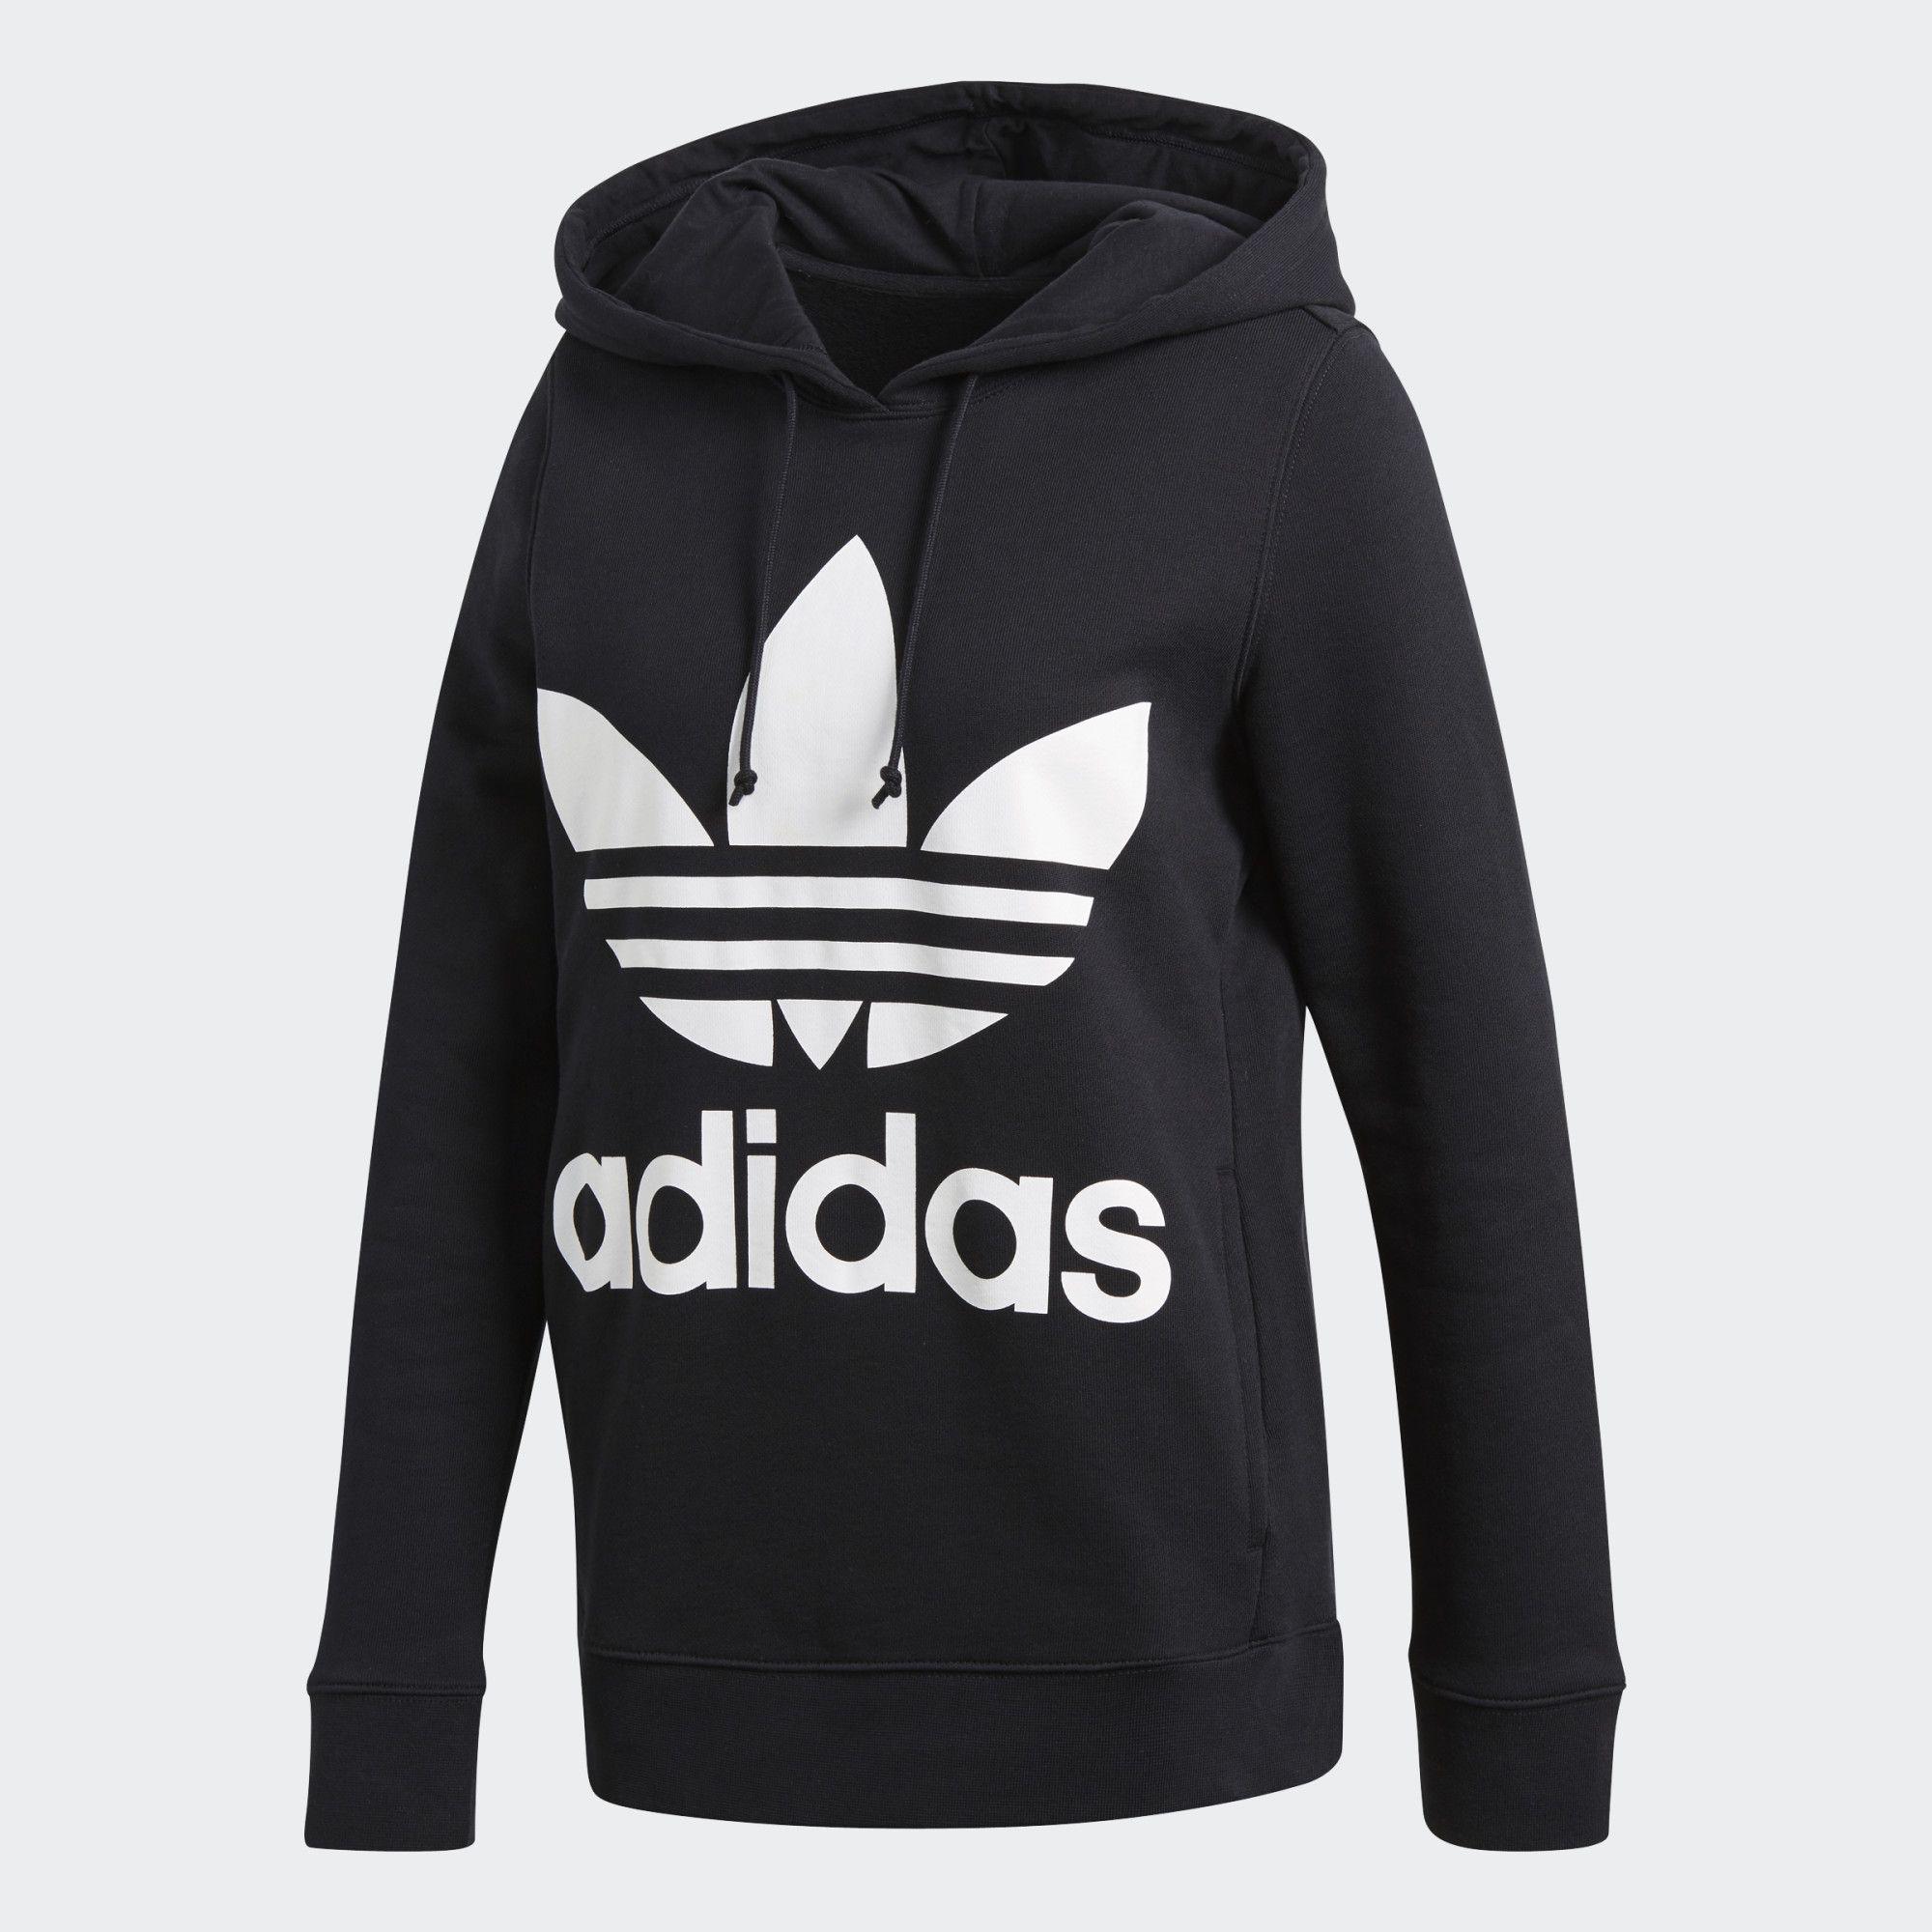 Adidas Trefoil Hoodie Black Adidas Us Adidas Originals Women Addidas Shirts Hoodies [ 2000 x 2000 Pixel ]